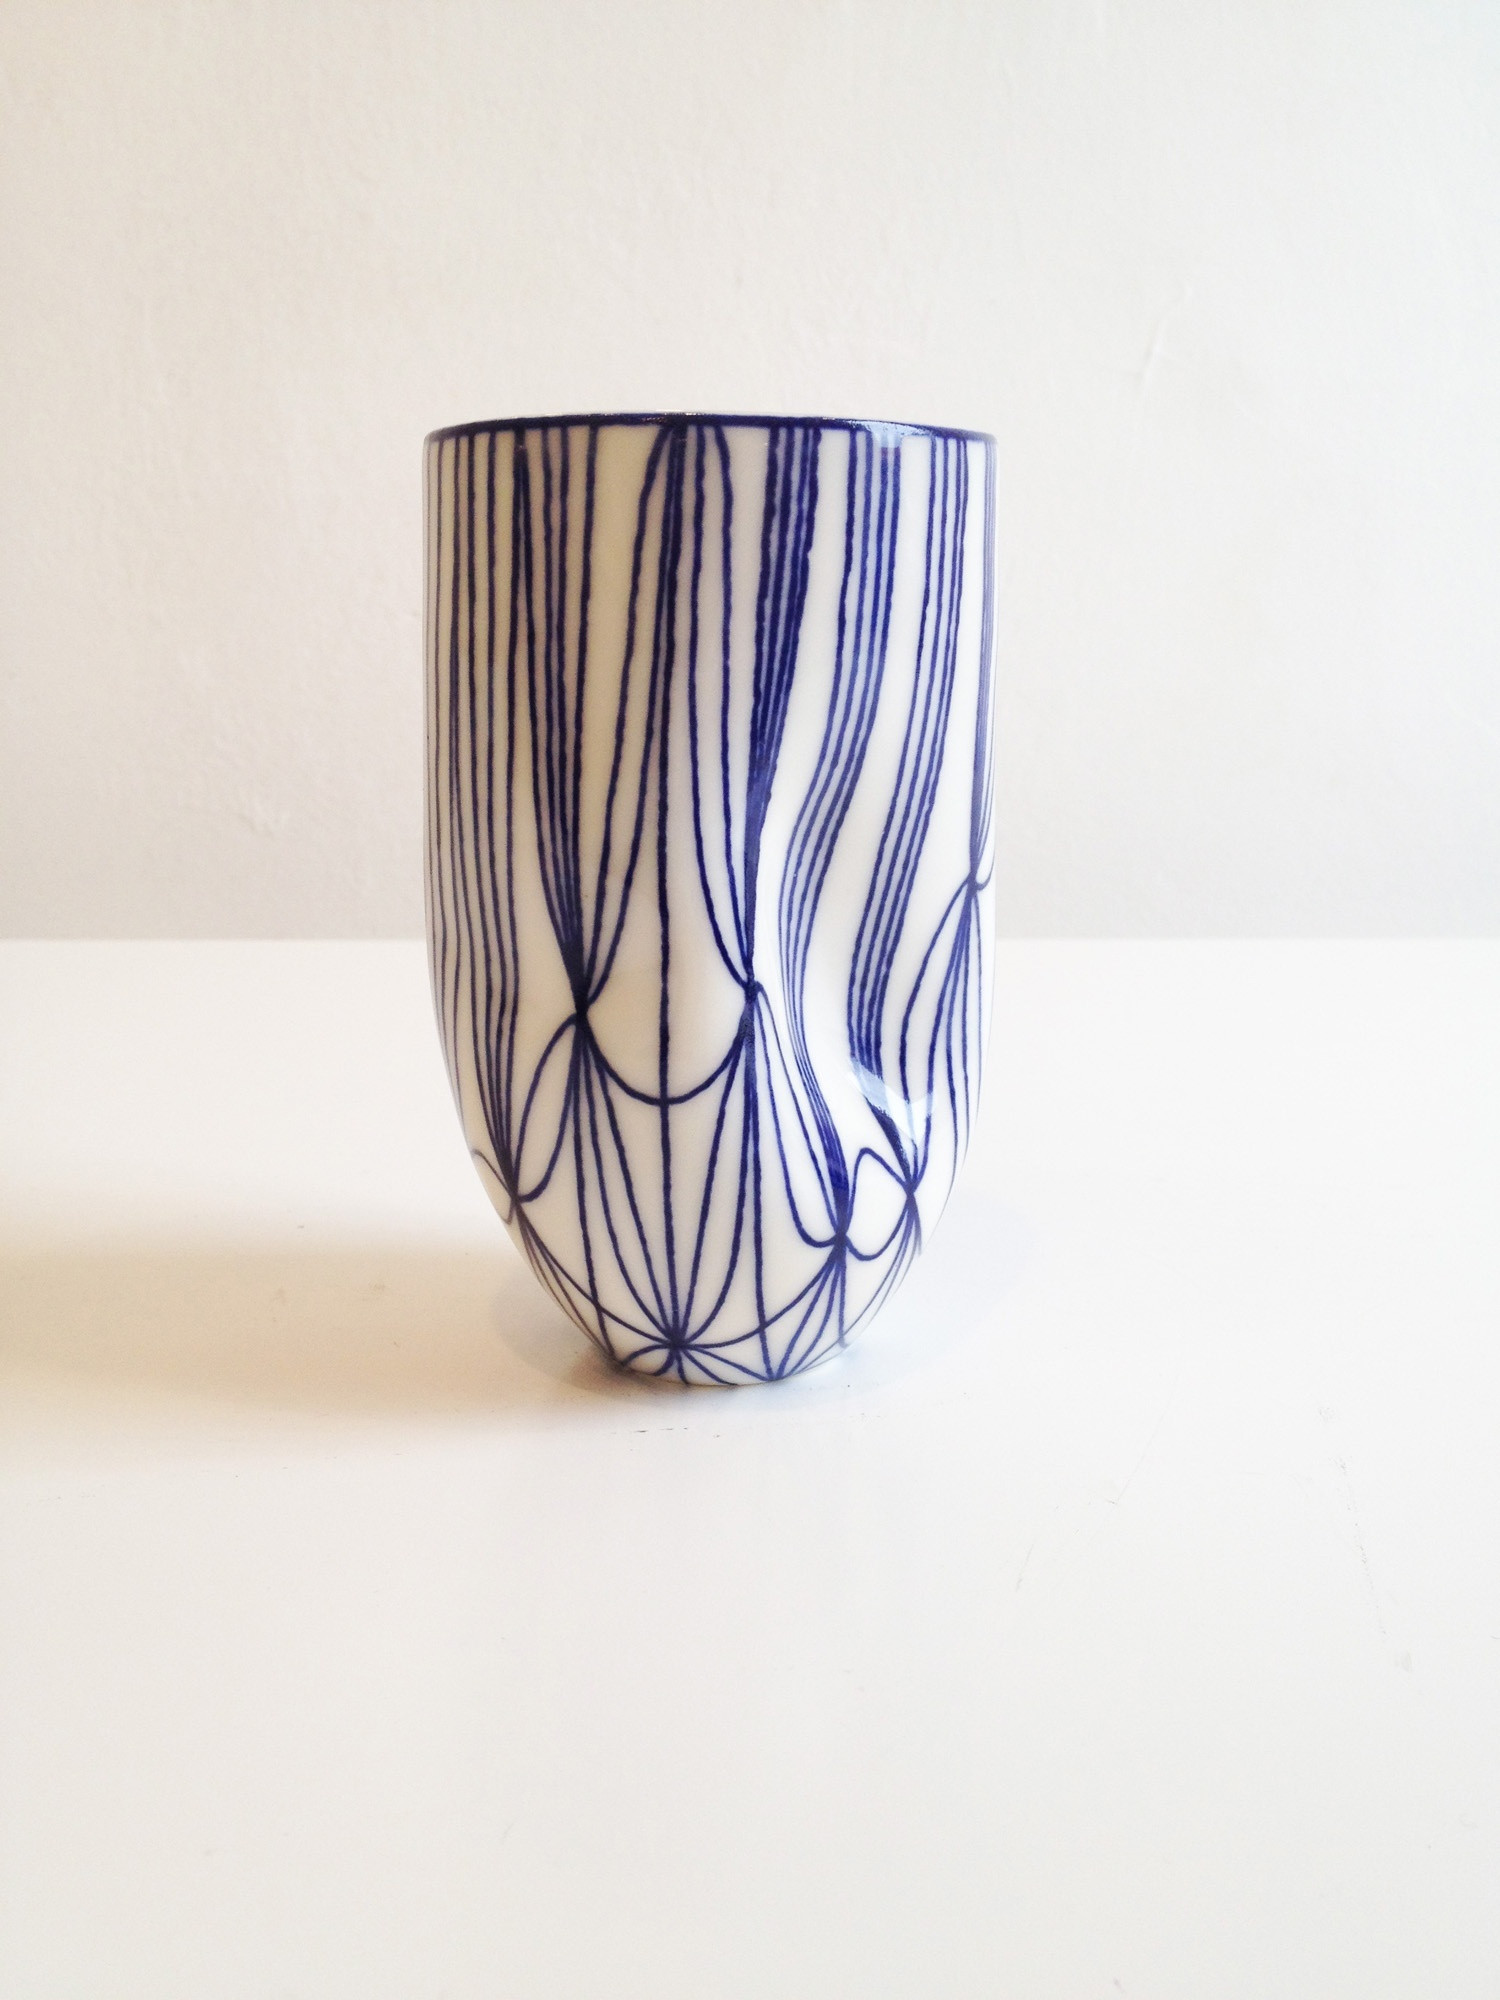 large cobalt blue glass vase of handheld vessel with external pattern large sarah wiseman gallery throughout handheld vessel with external pattern large